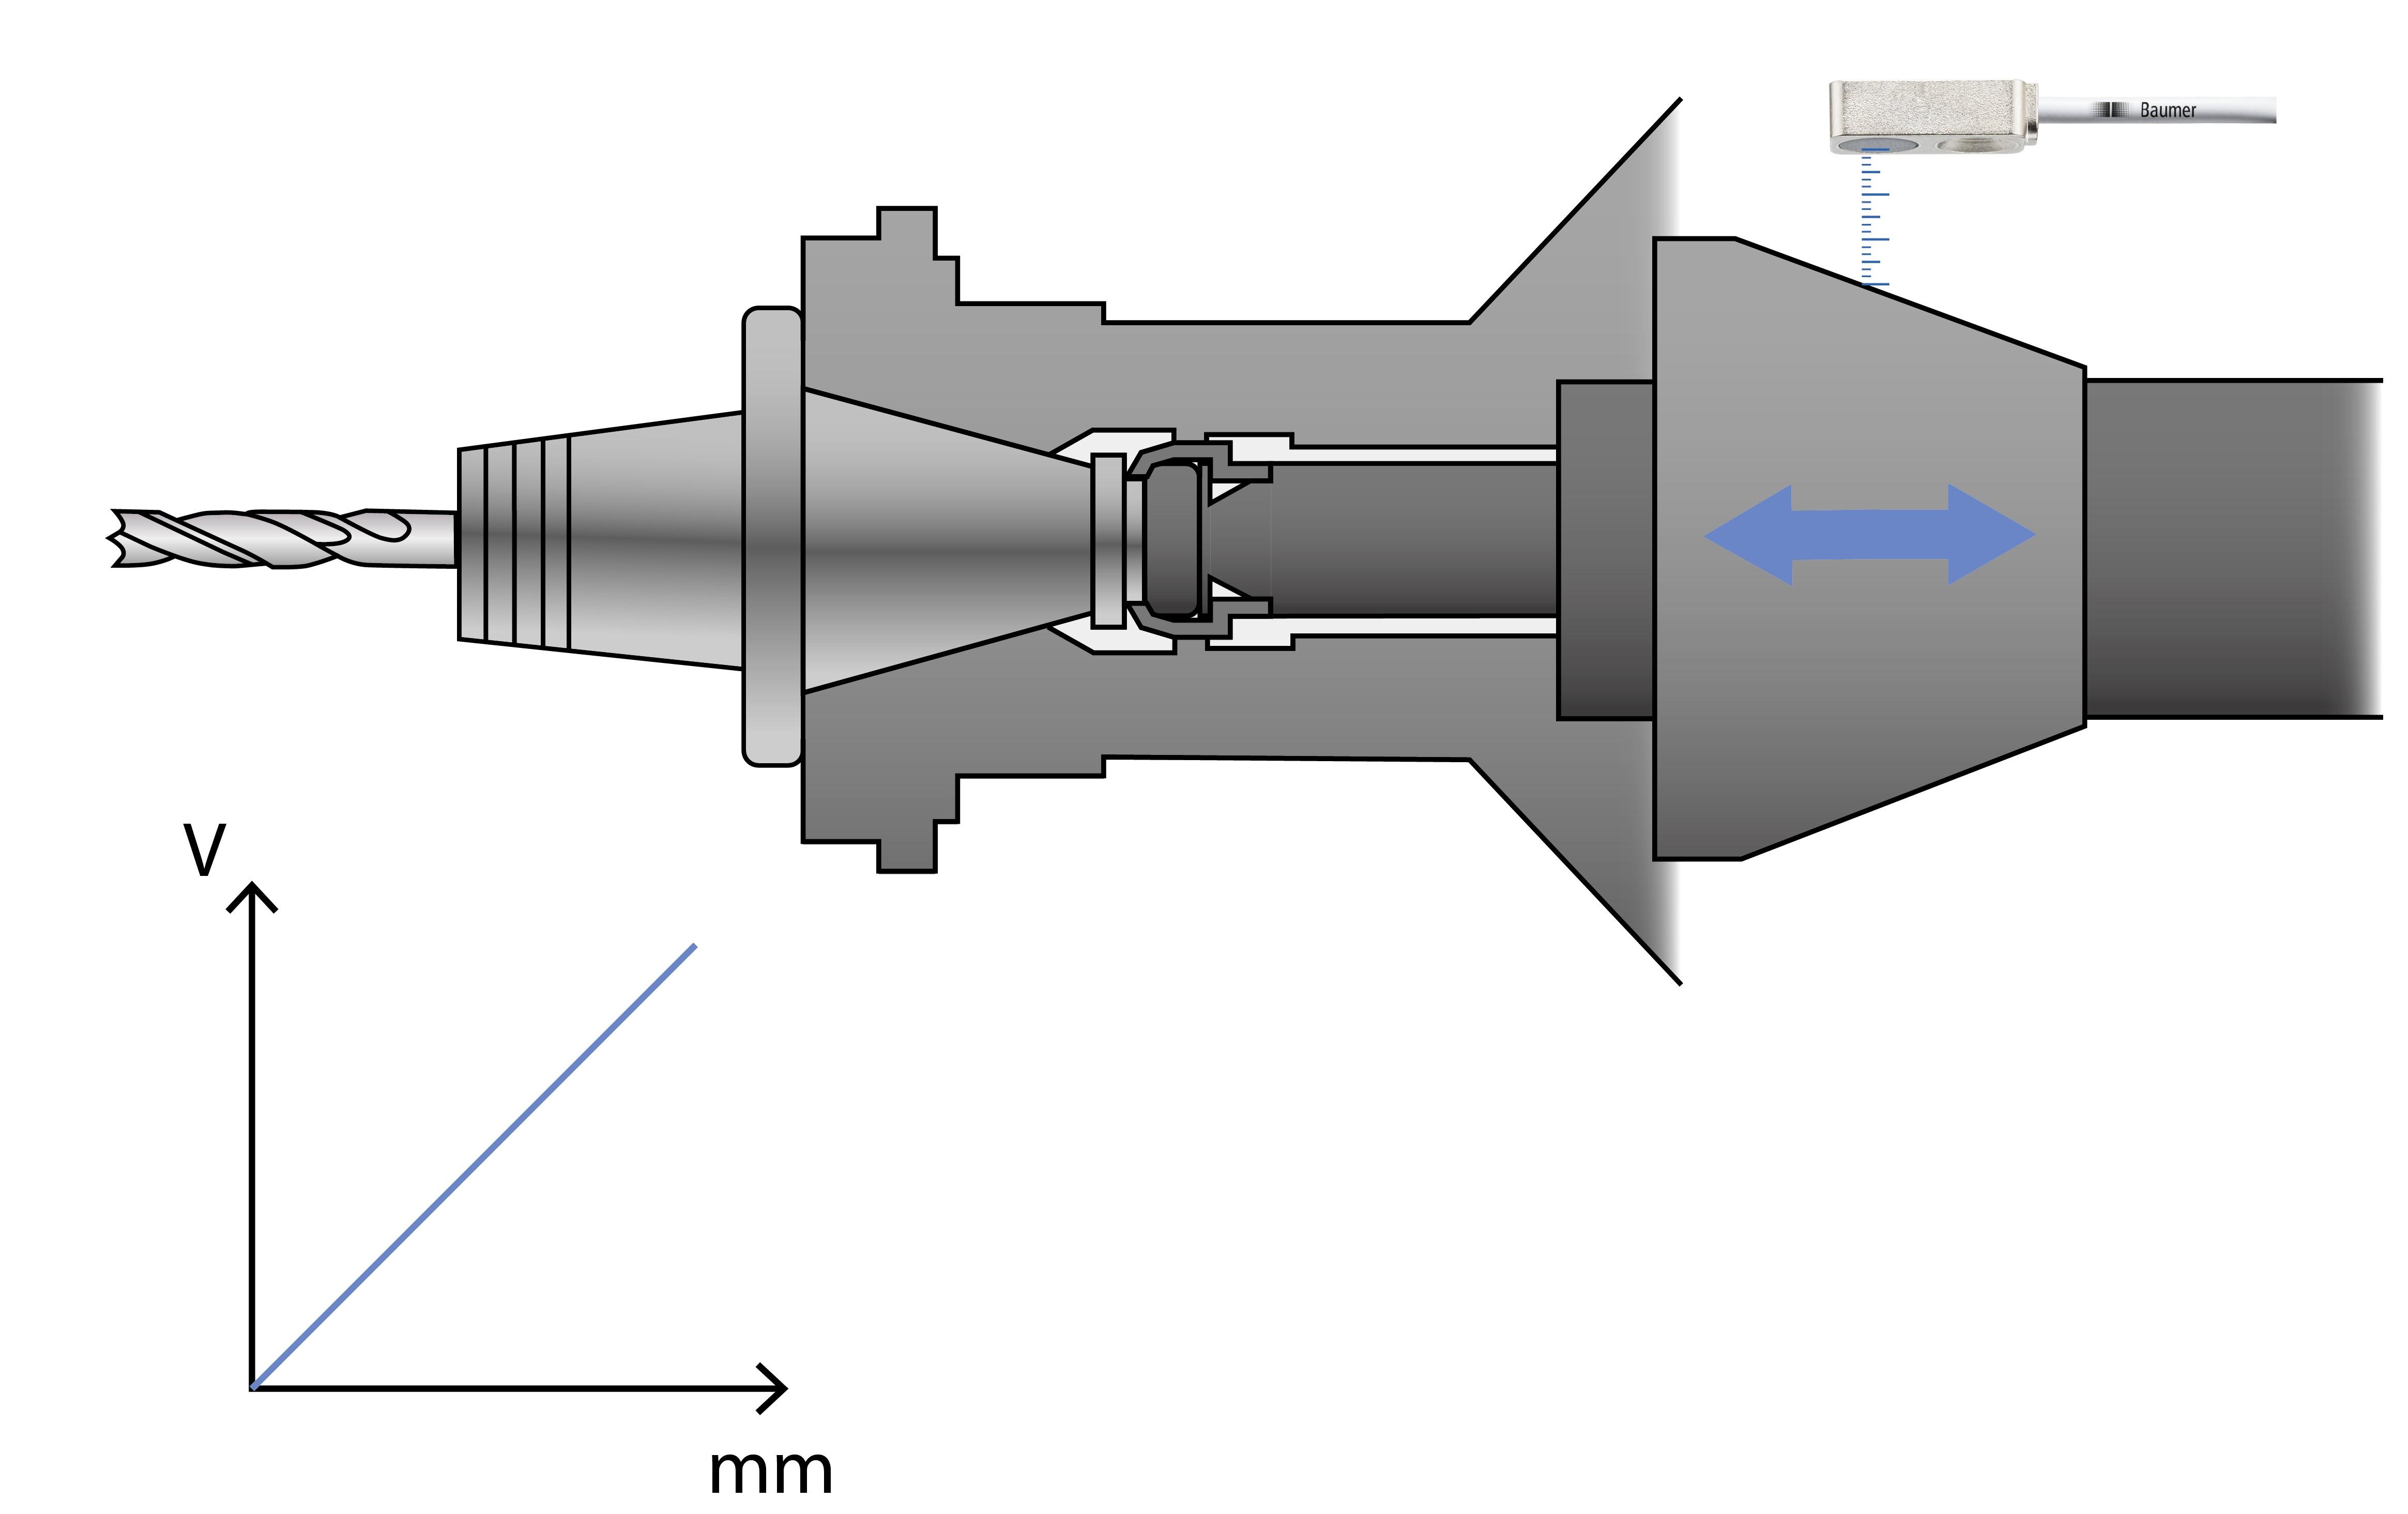 Baumer_Analog-inductive-sensor-solution_ML_20200326_PH